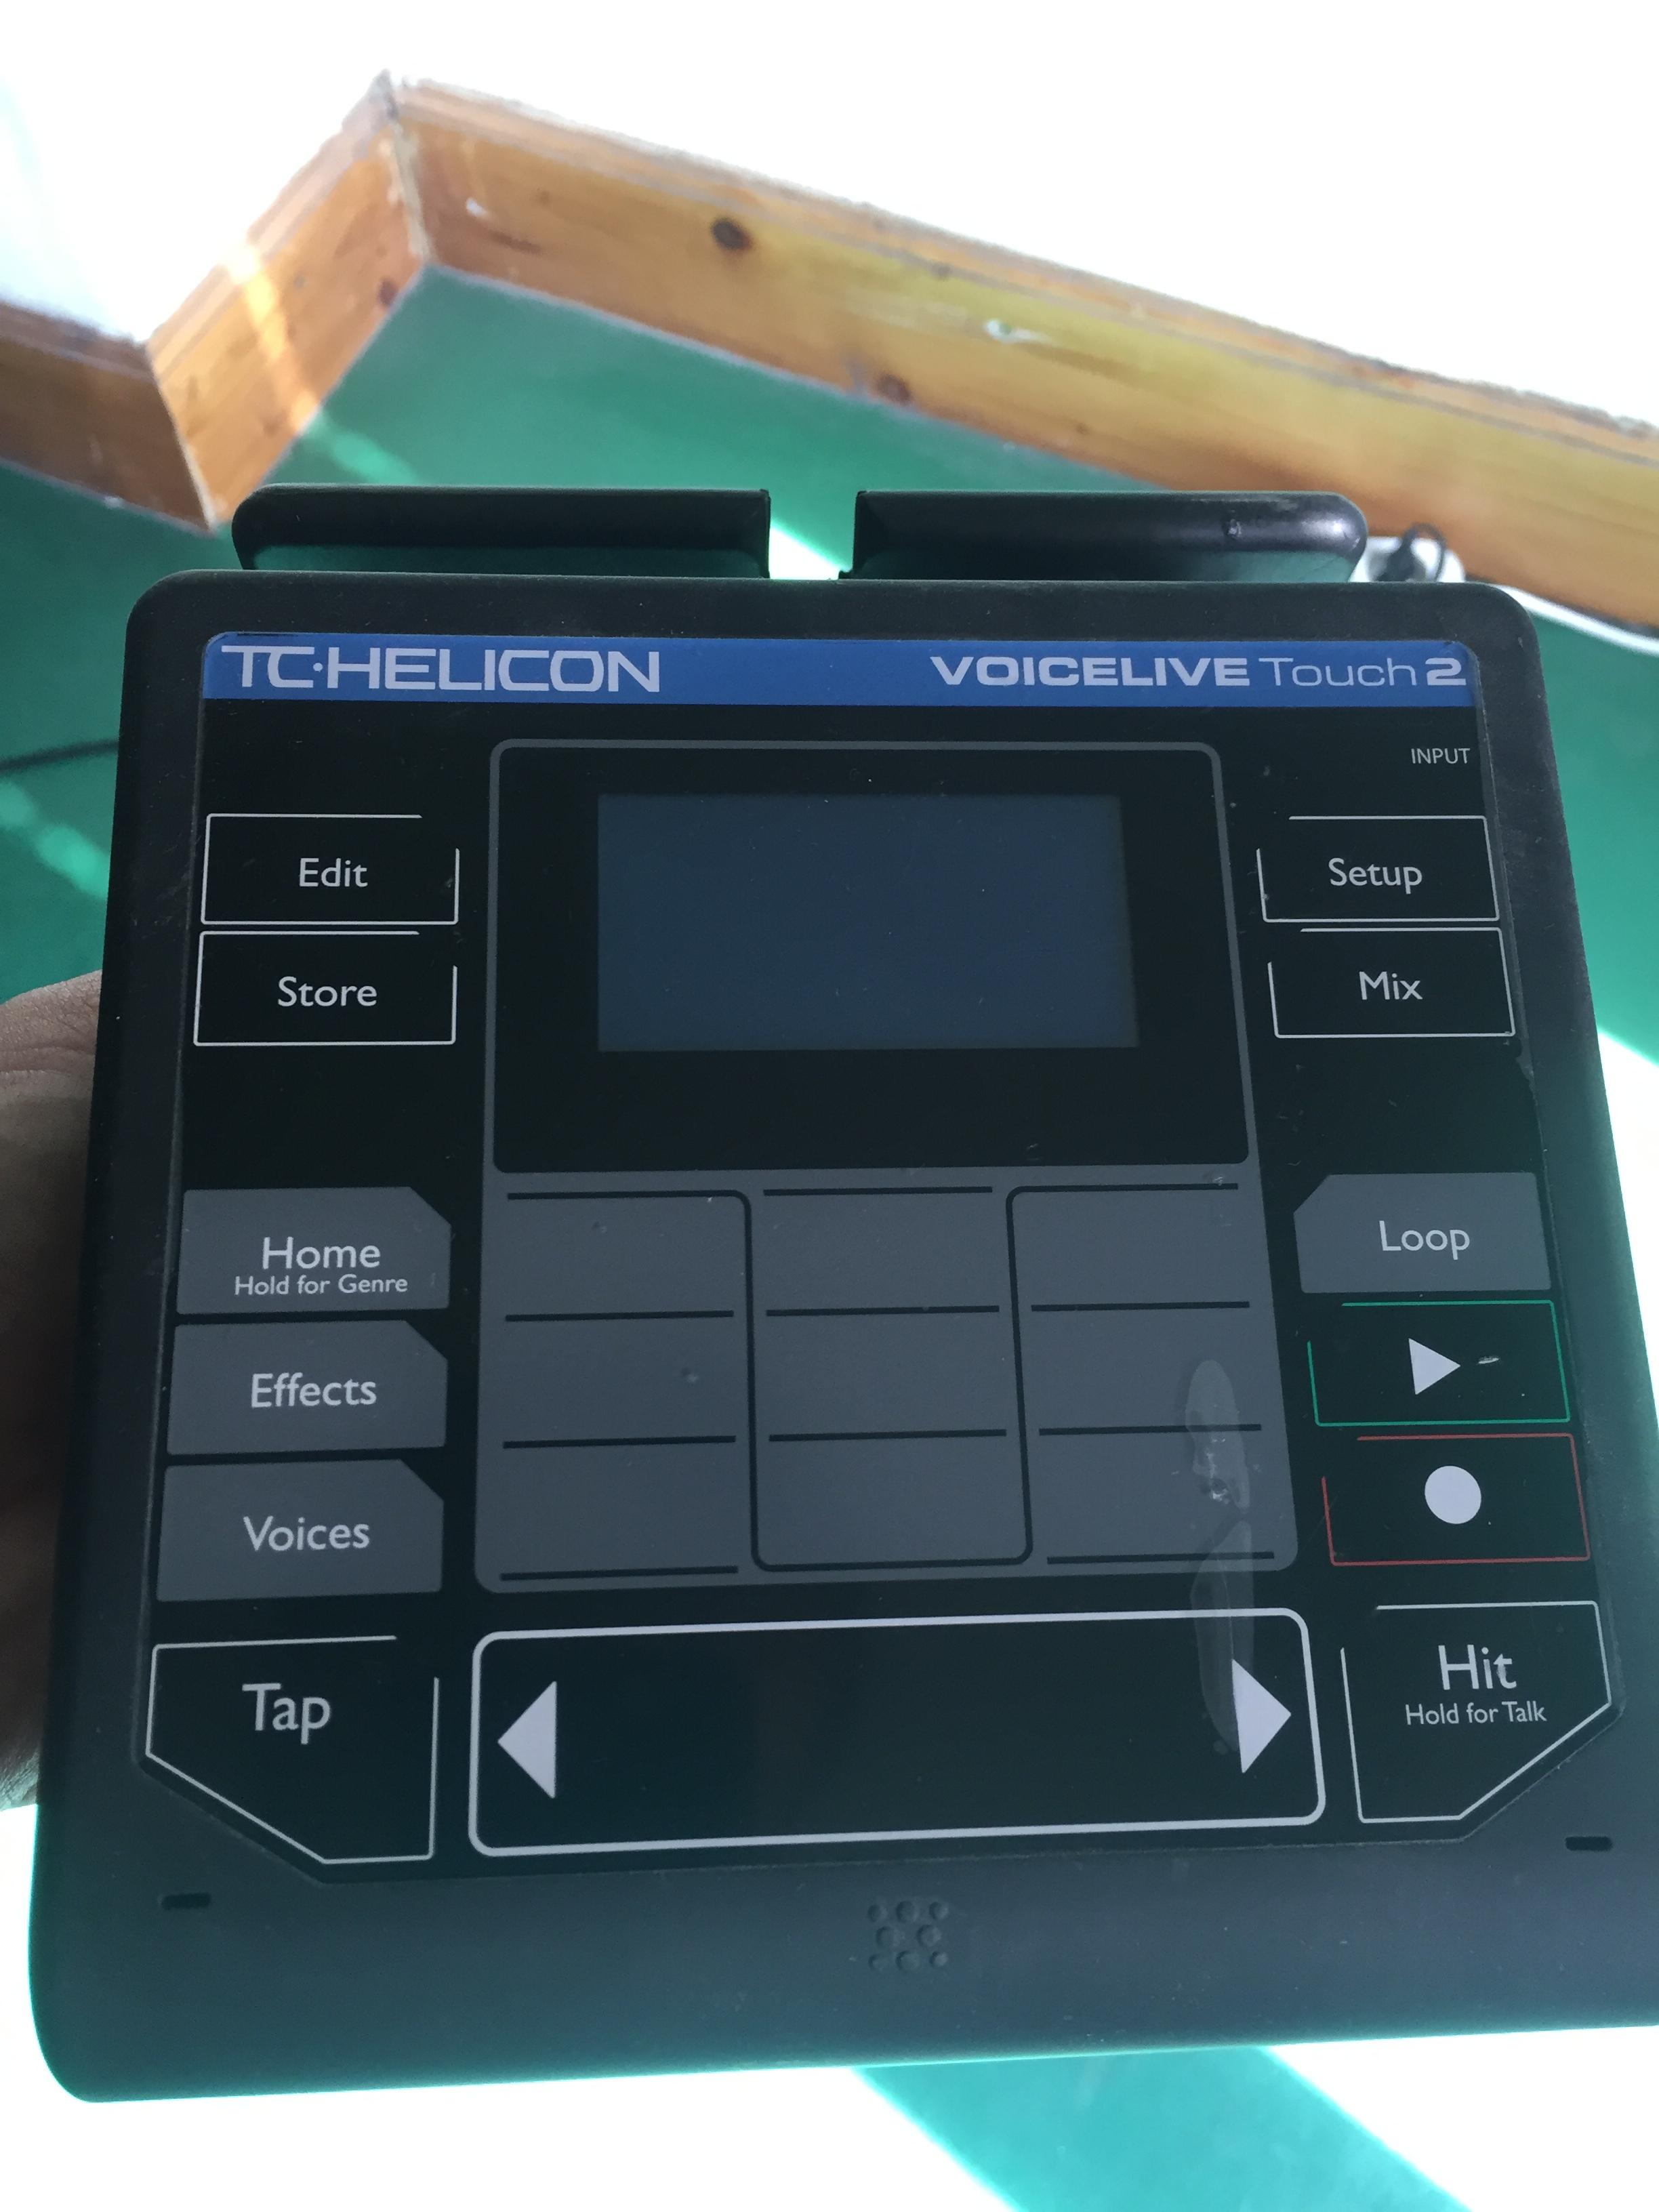 tc helicon voicelive touch 2 image 1420074 audiofanzine. Black Bedroom Furniture Sets. Home Design Ideas